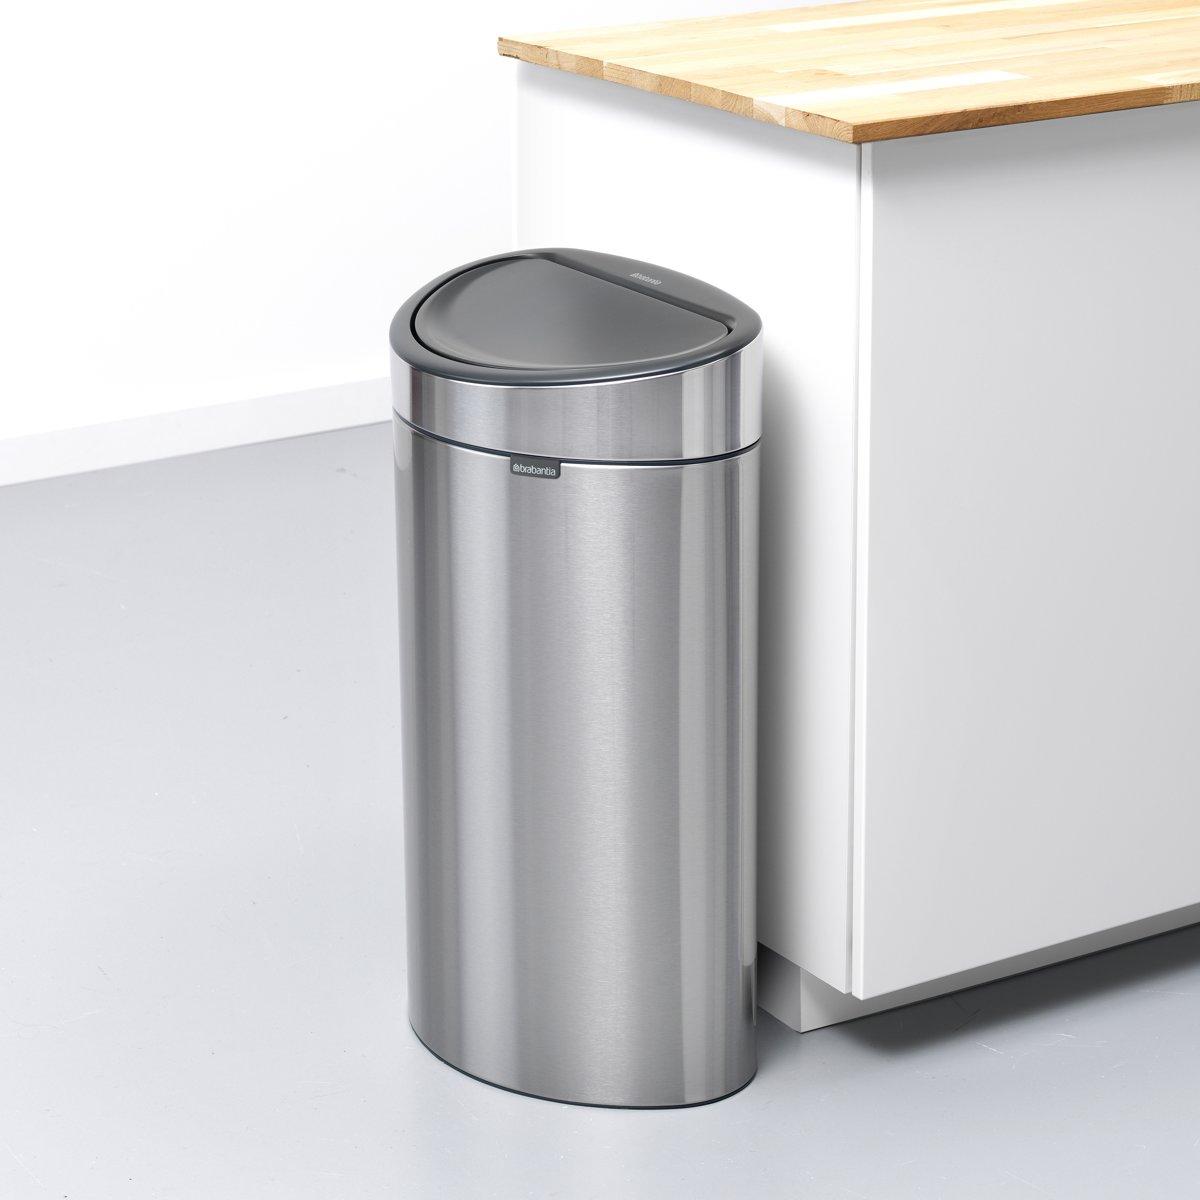 Brabantia Touch Bin Rvs.Bol Com Brabantia Touch Bin Recycle Prullenbak 10 23 L Matt Steel